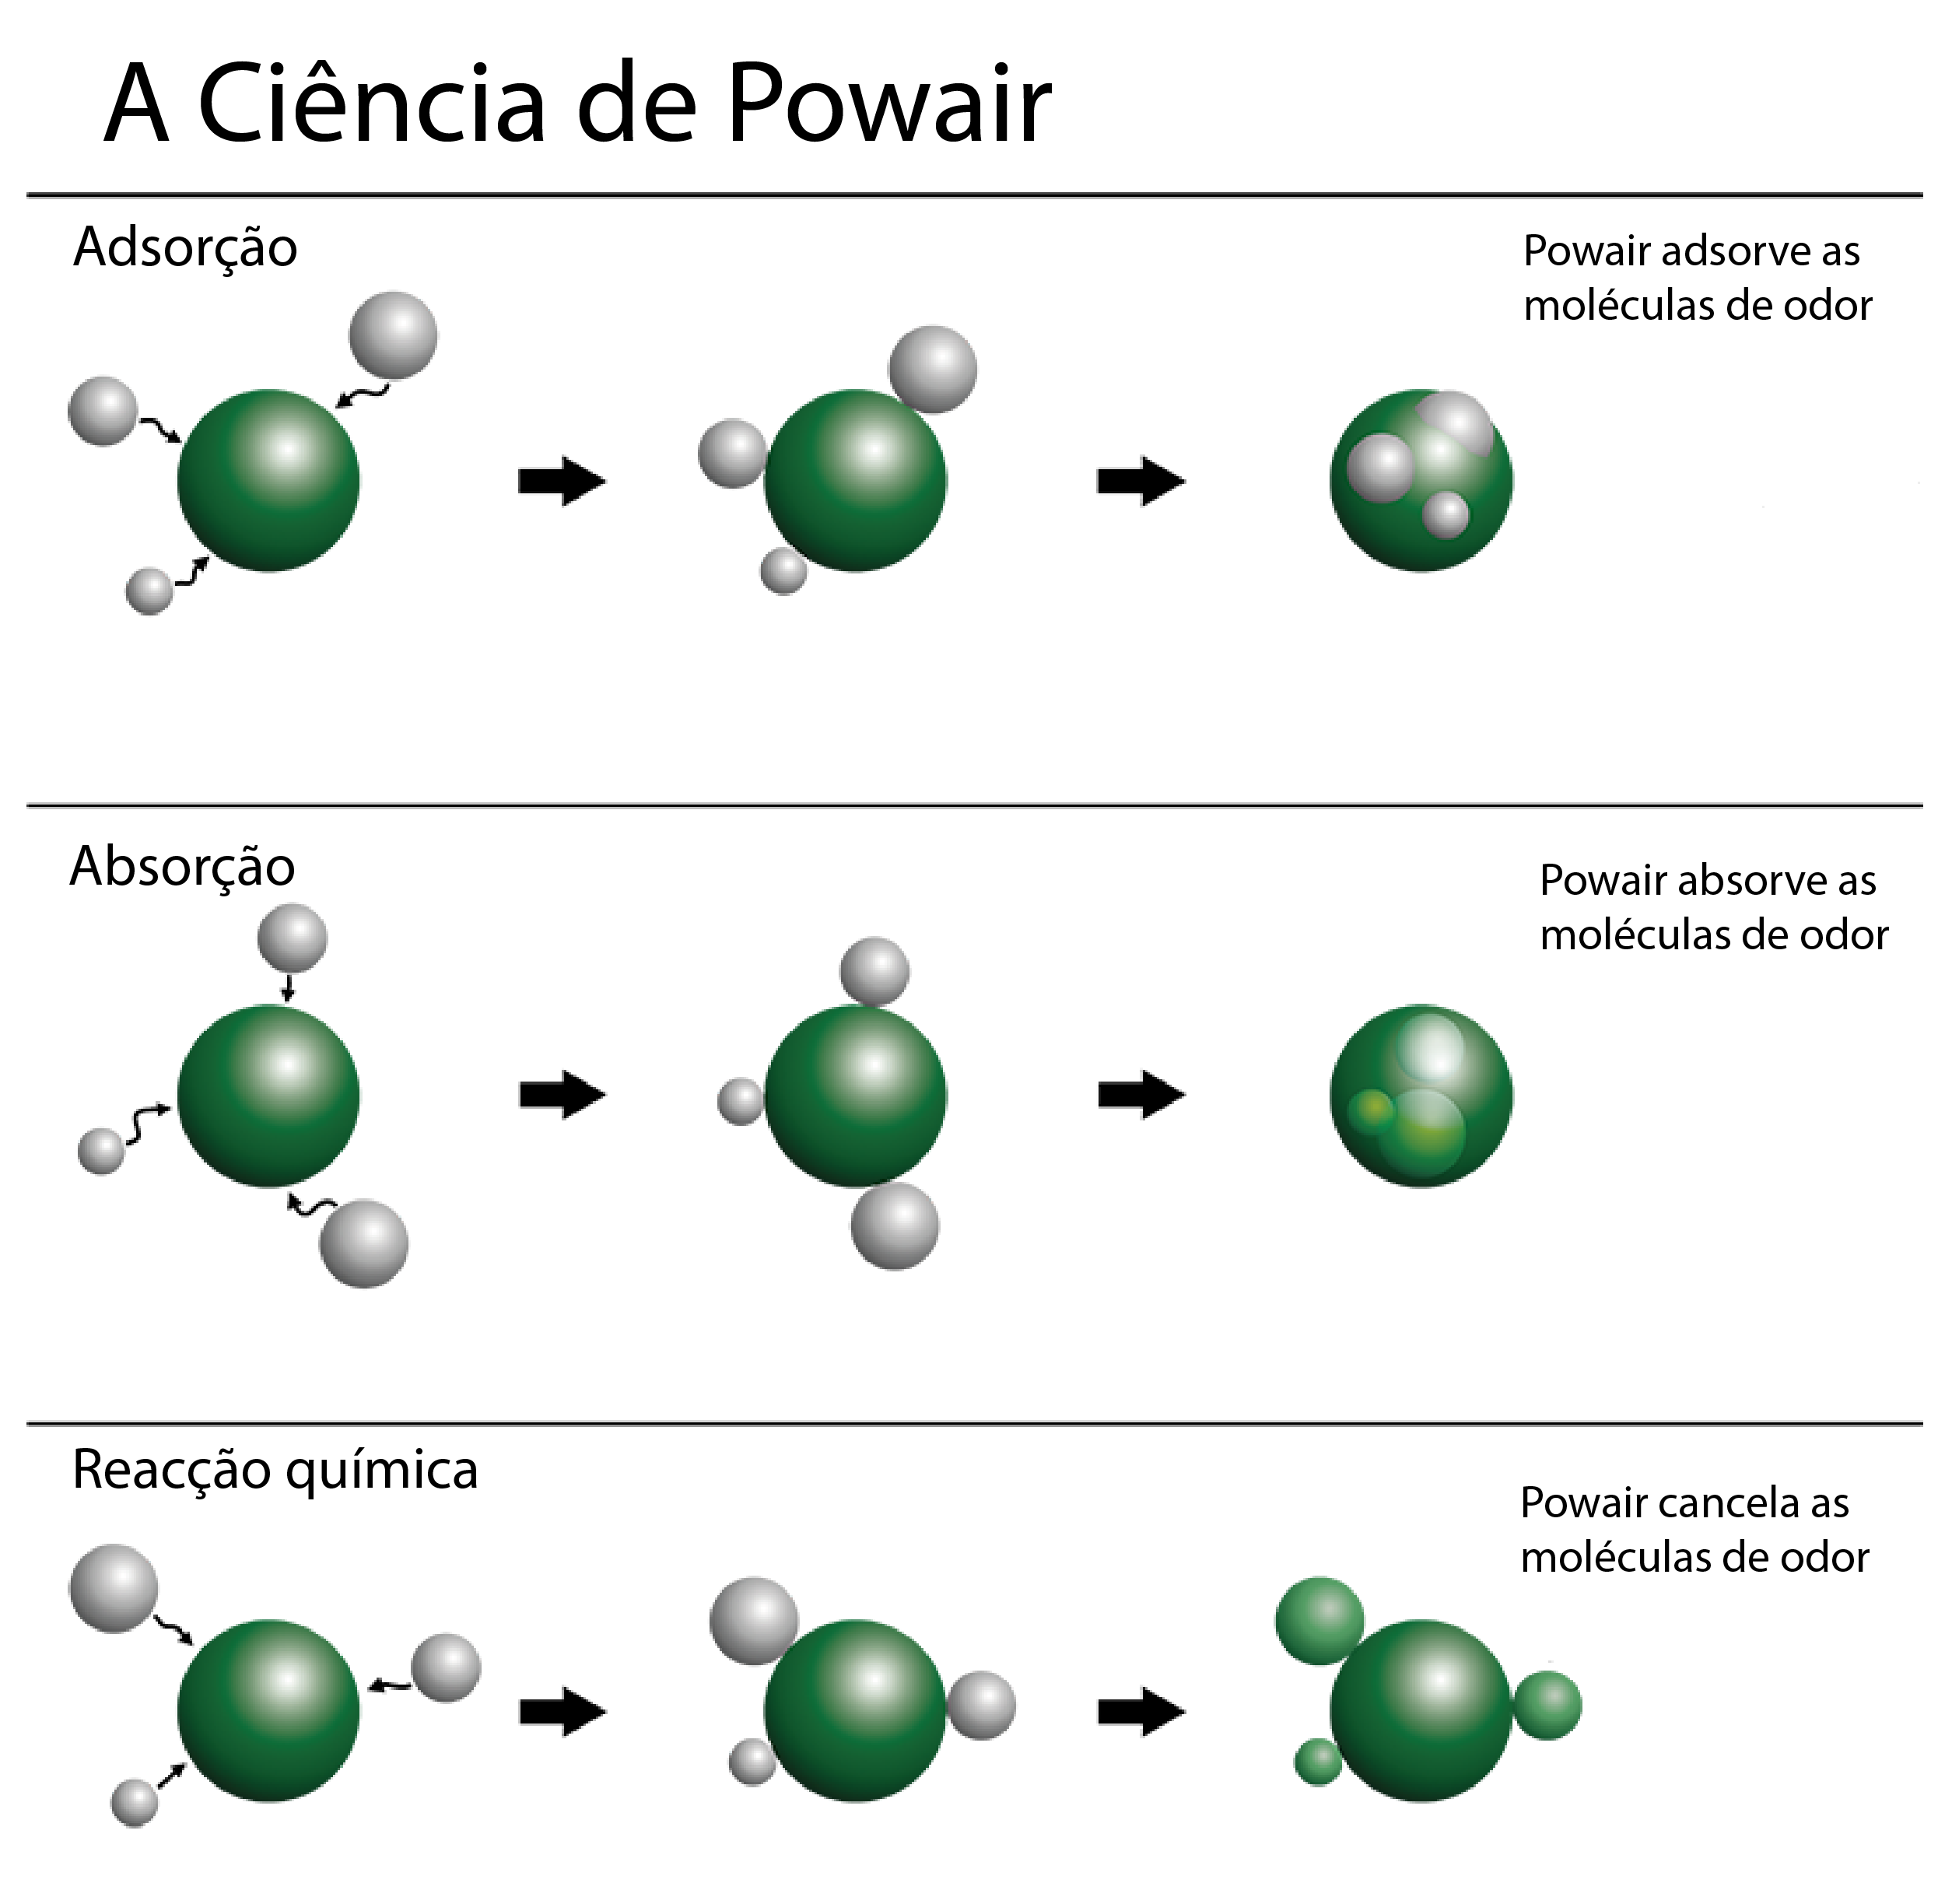 a-ciencia-de-powair